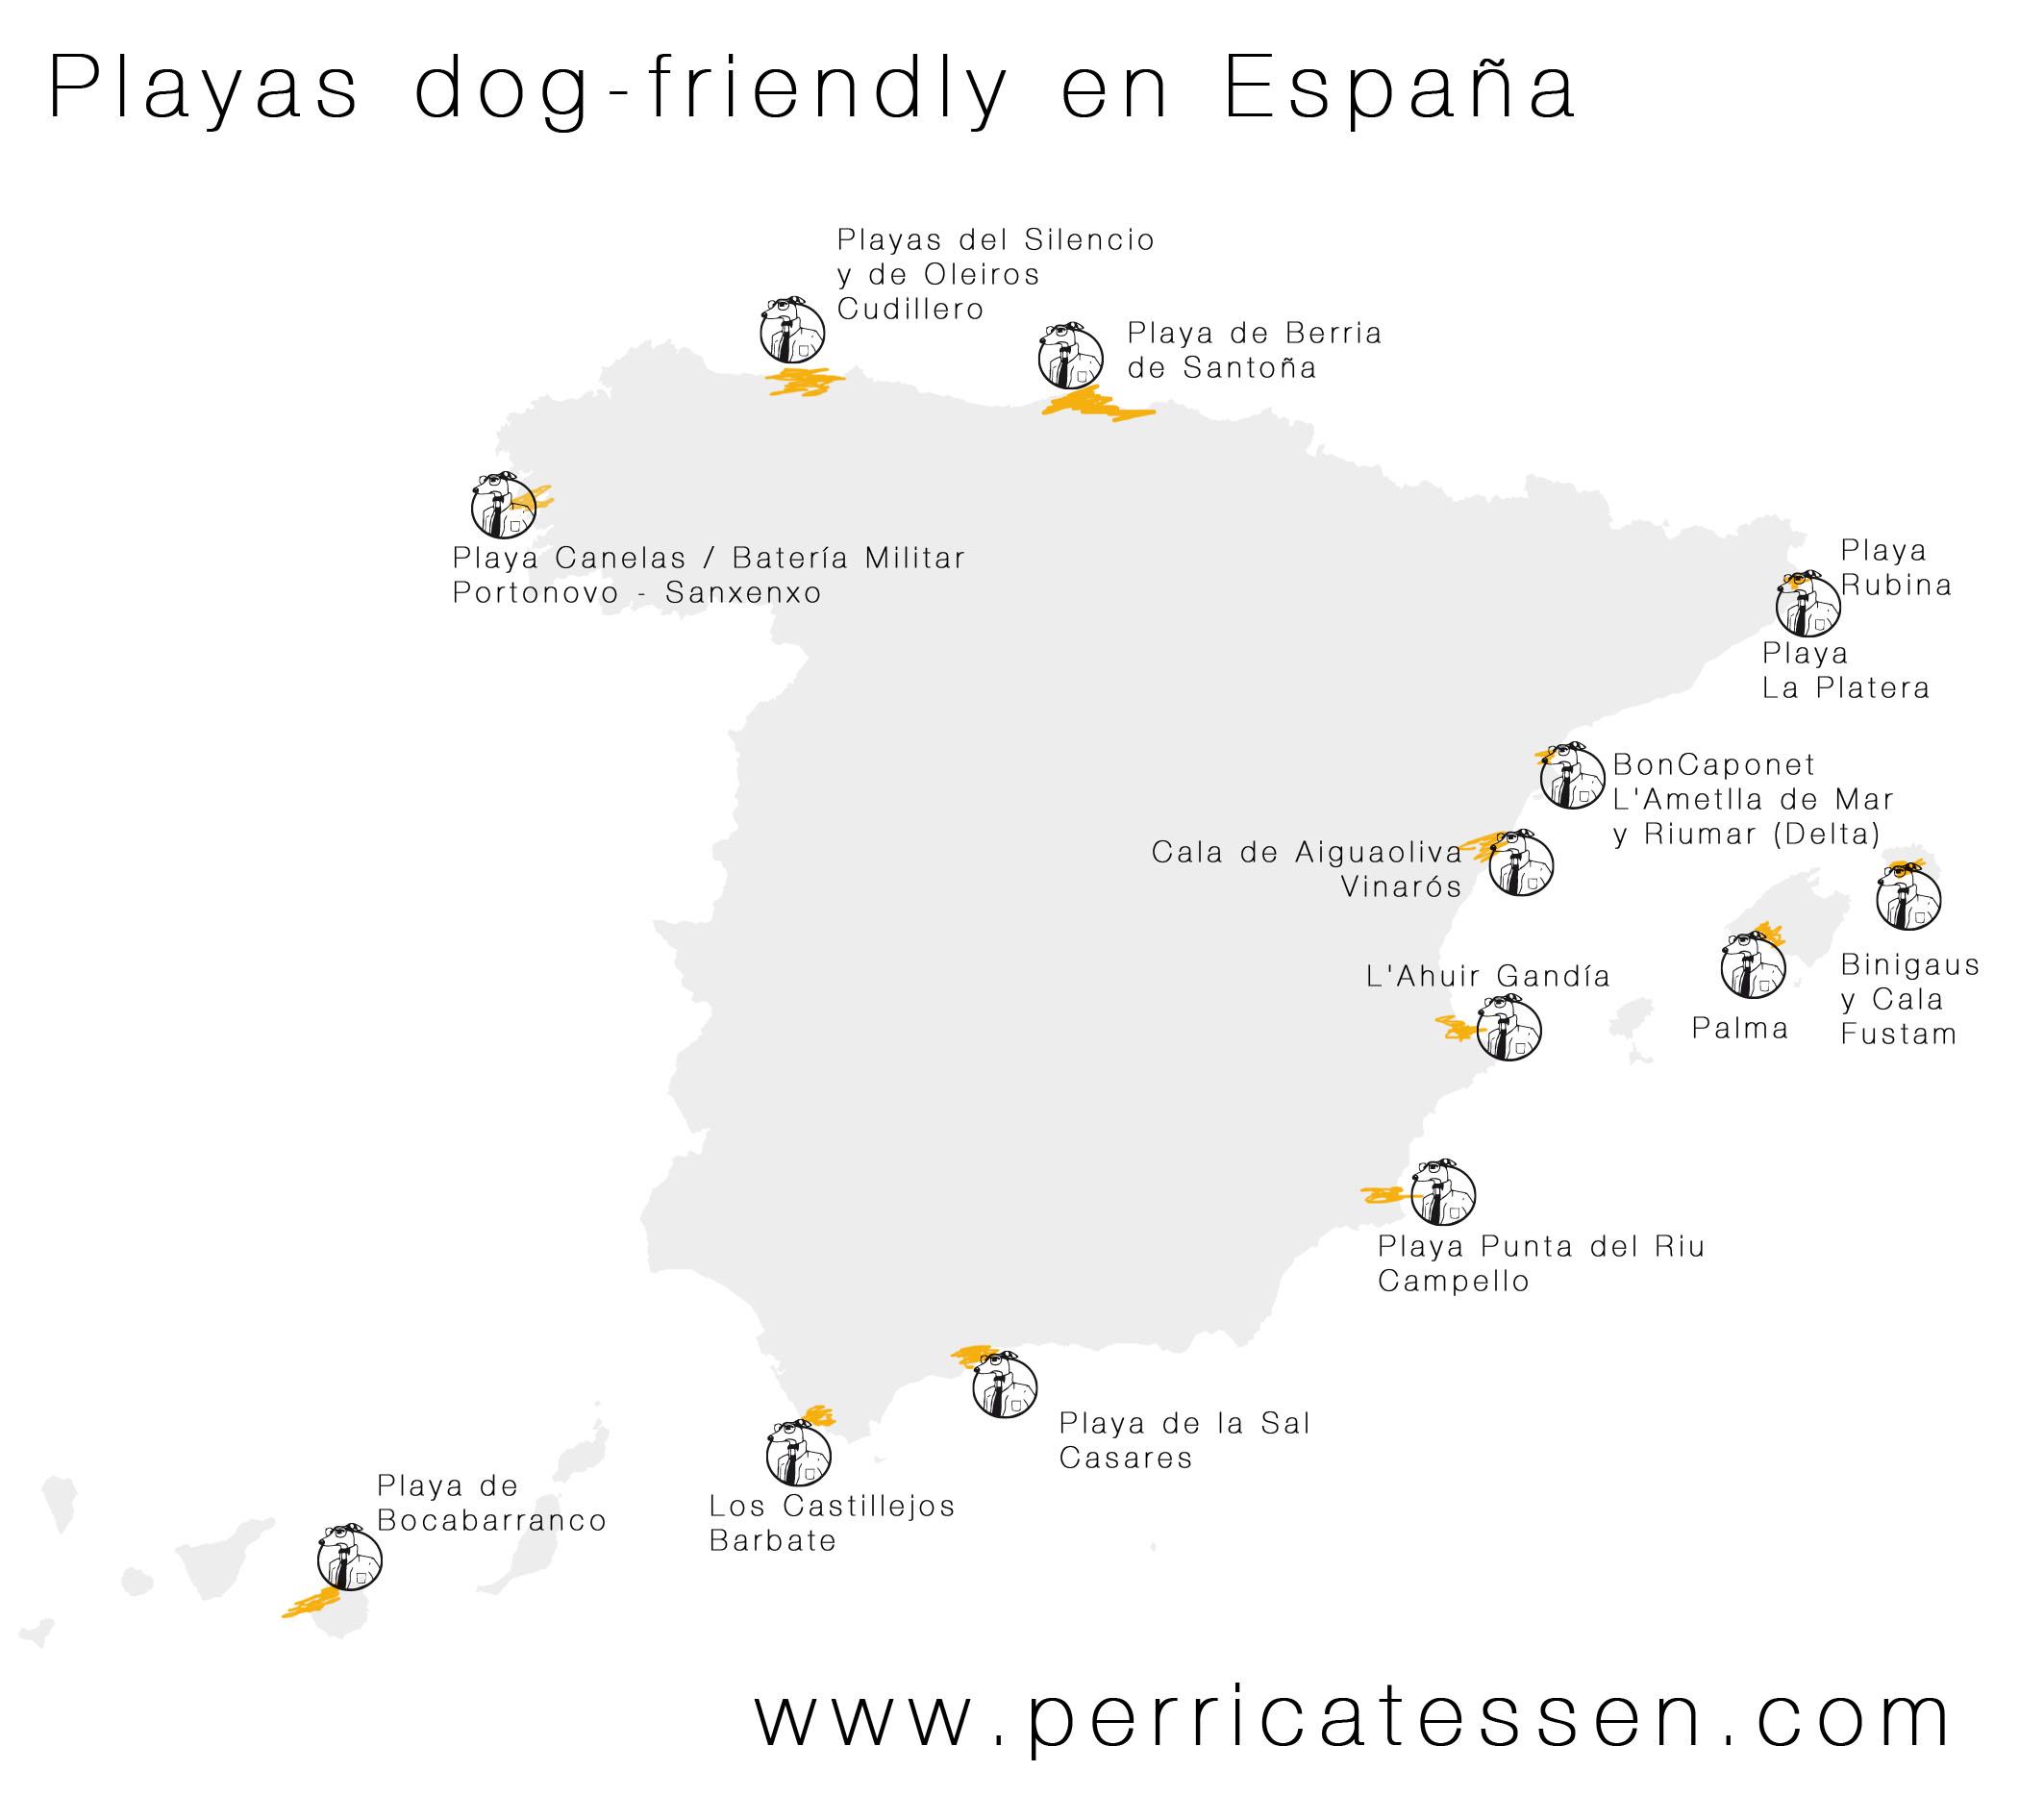 Playas dog-friendly en España